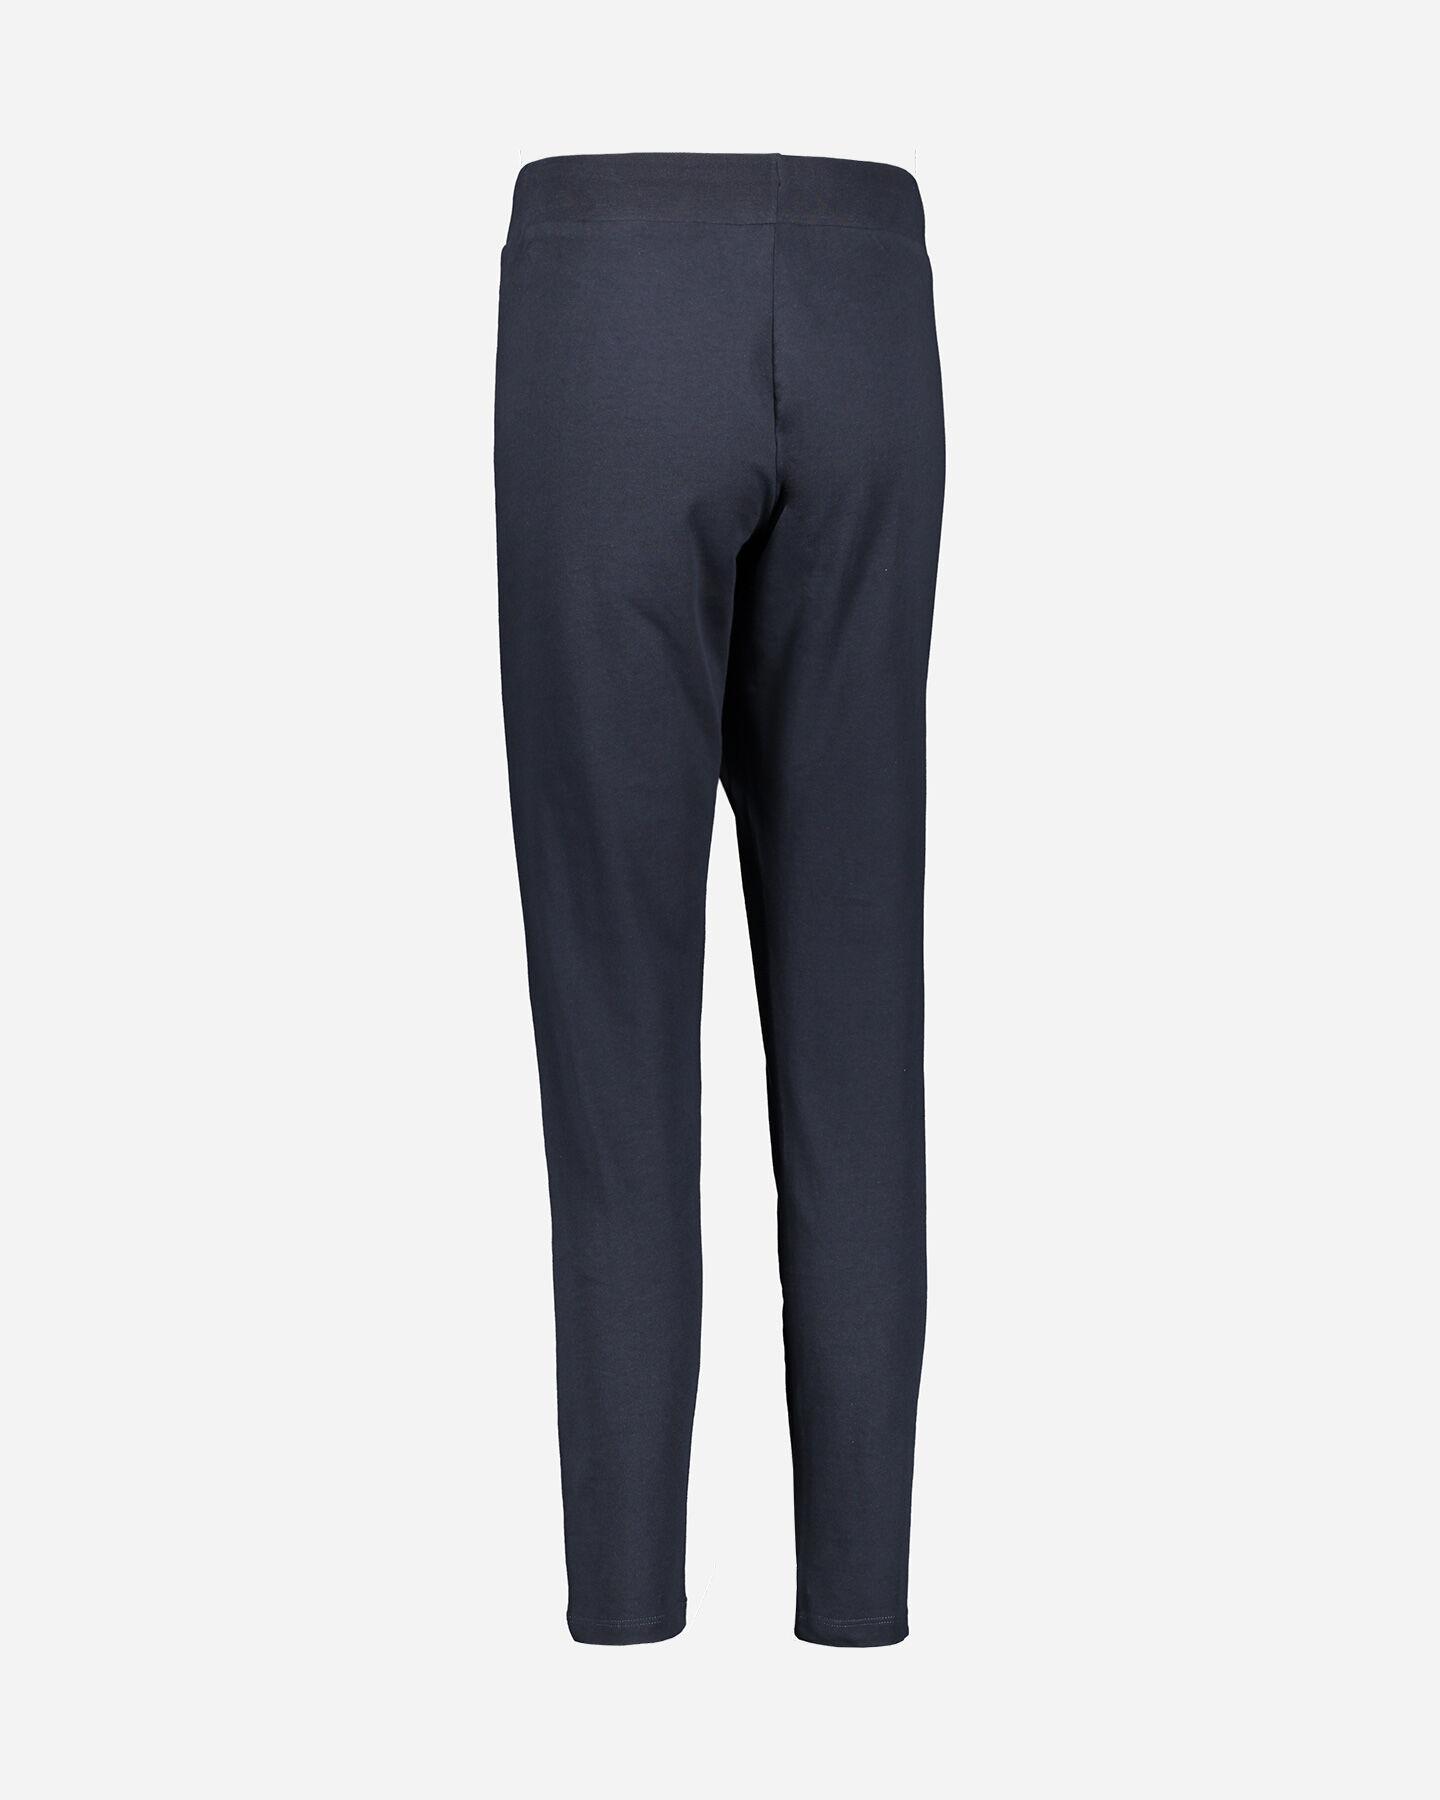 Pantalone FREDDY ATHLETICS W S5183707 scatto 2